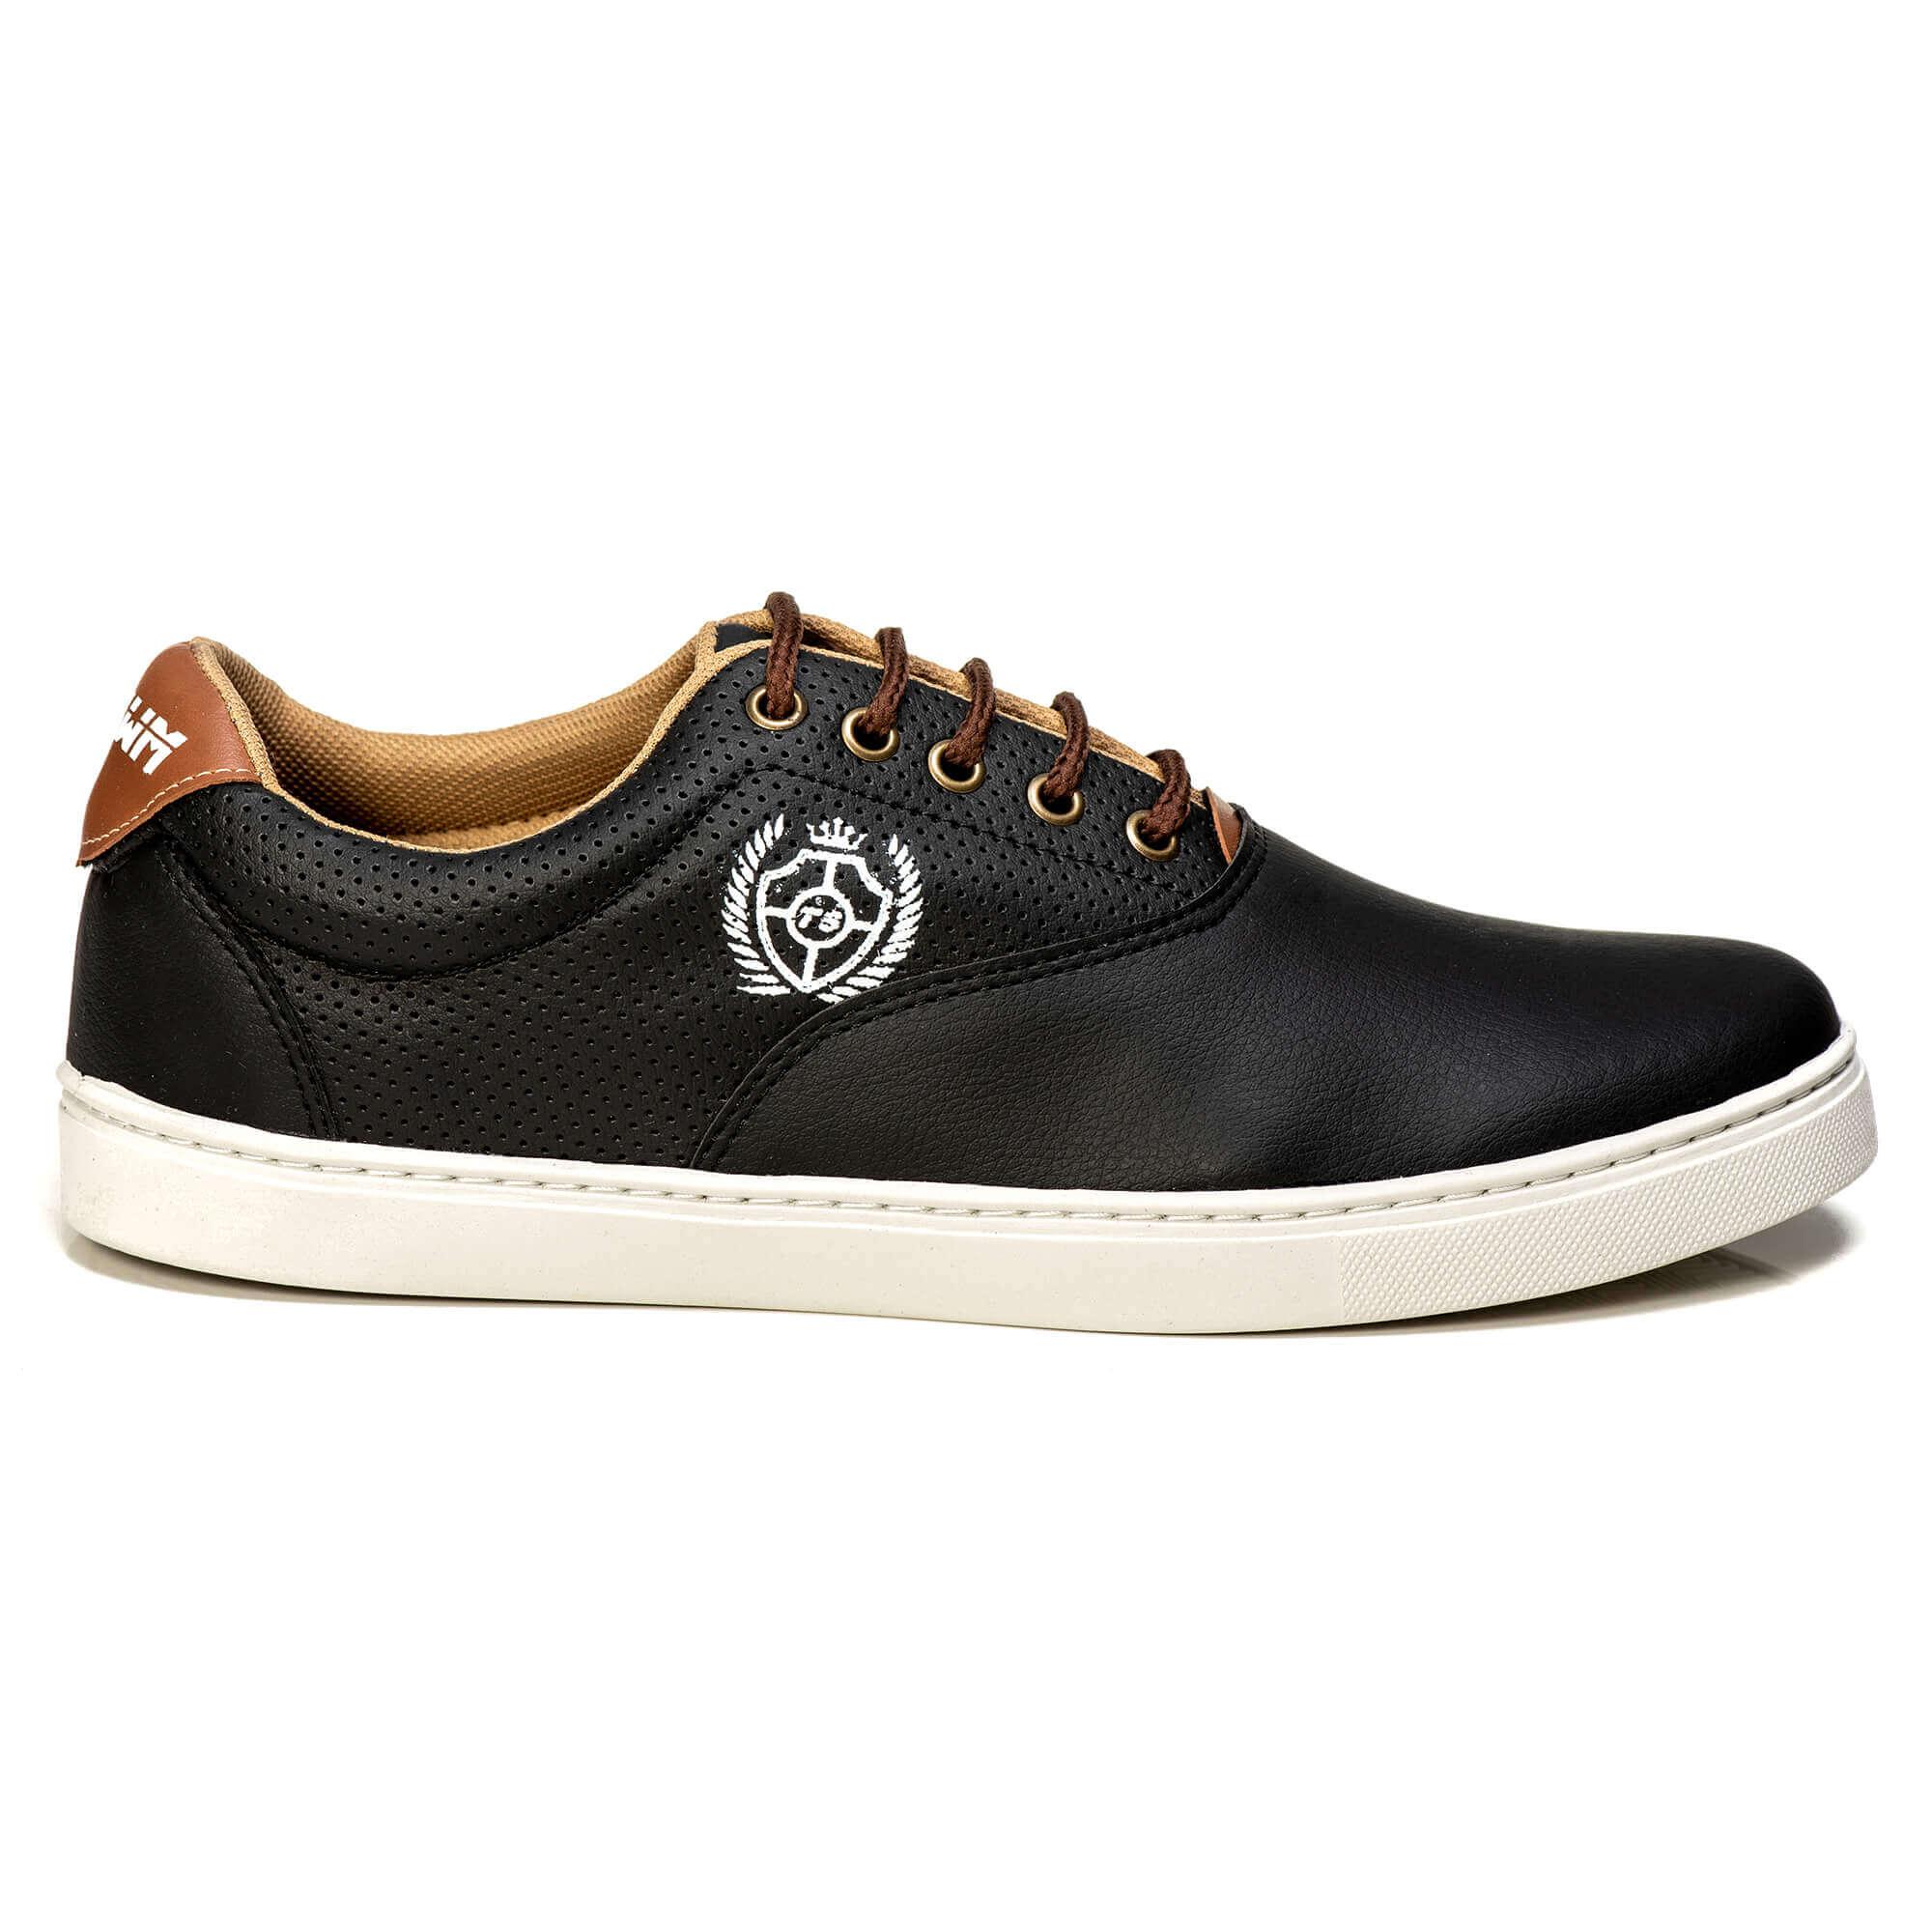 Tênis Polo Casual Masculino Tchwm Shoes Leve Macio Preto + Carteira